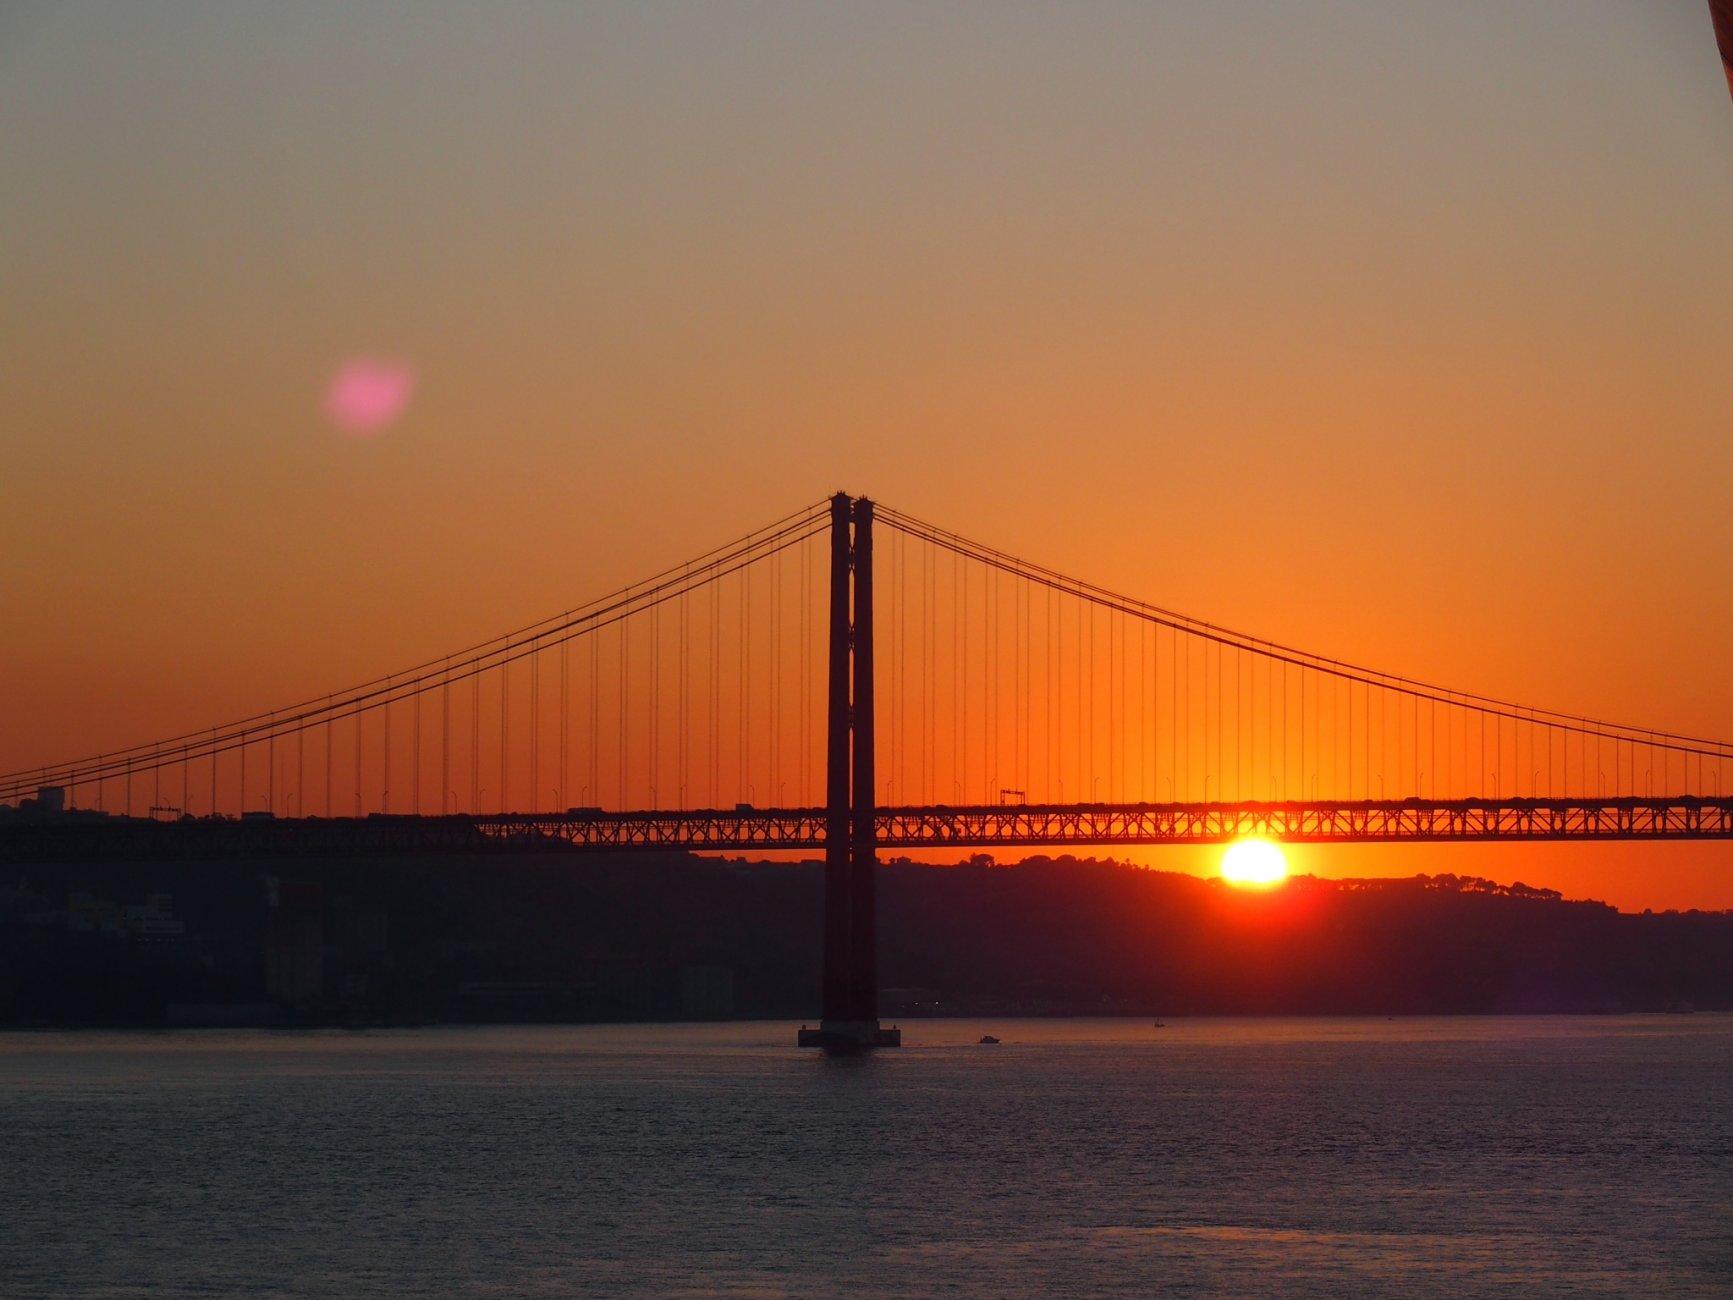 Lisbon, 25th April bridge.